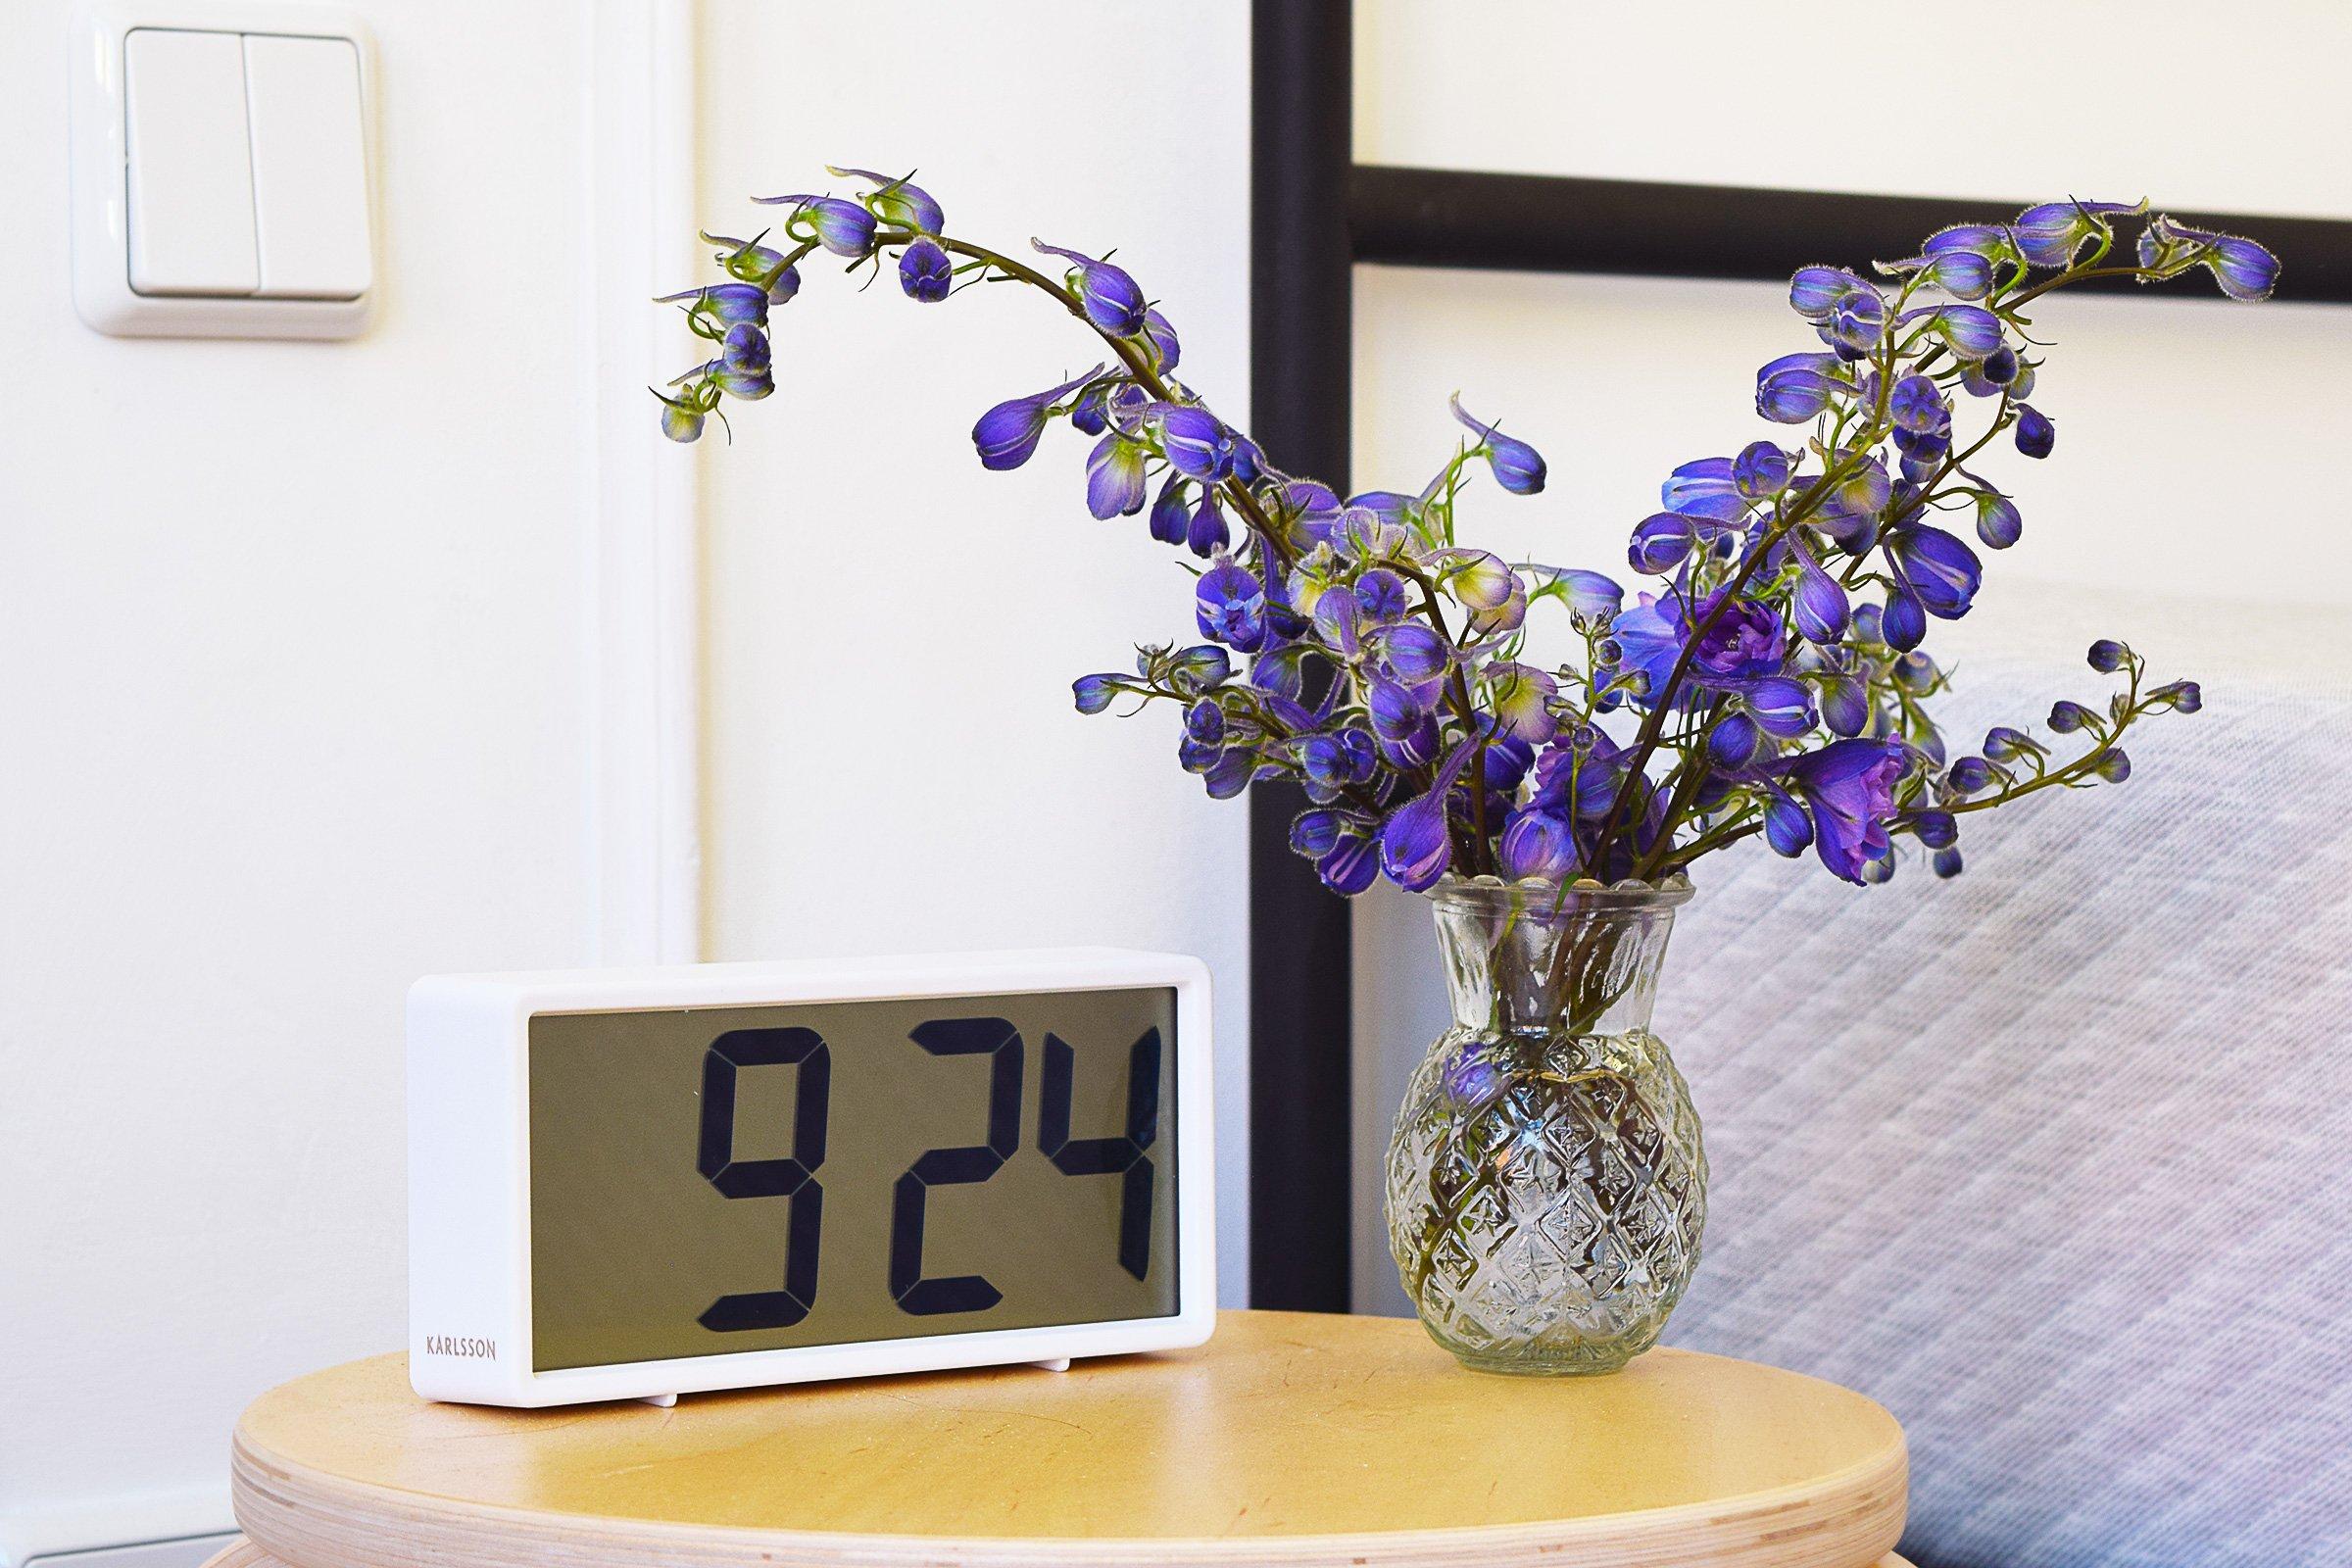 Alarm Clock From Hurn & Hurn | Little House On The Corner